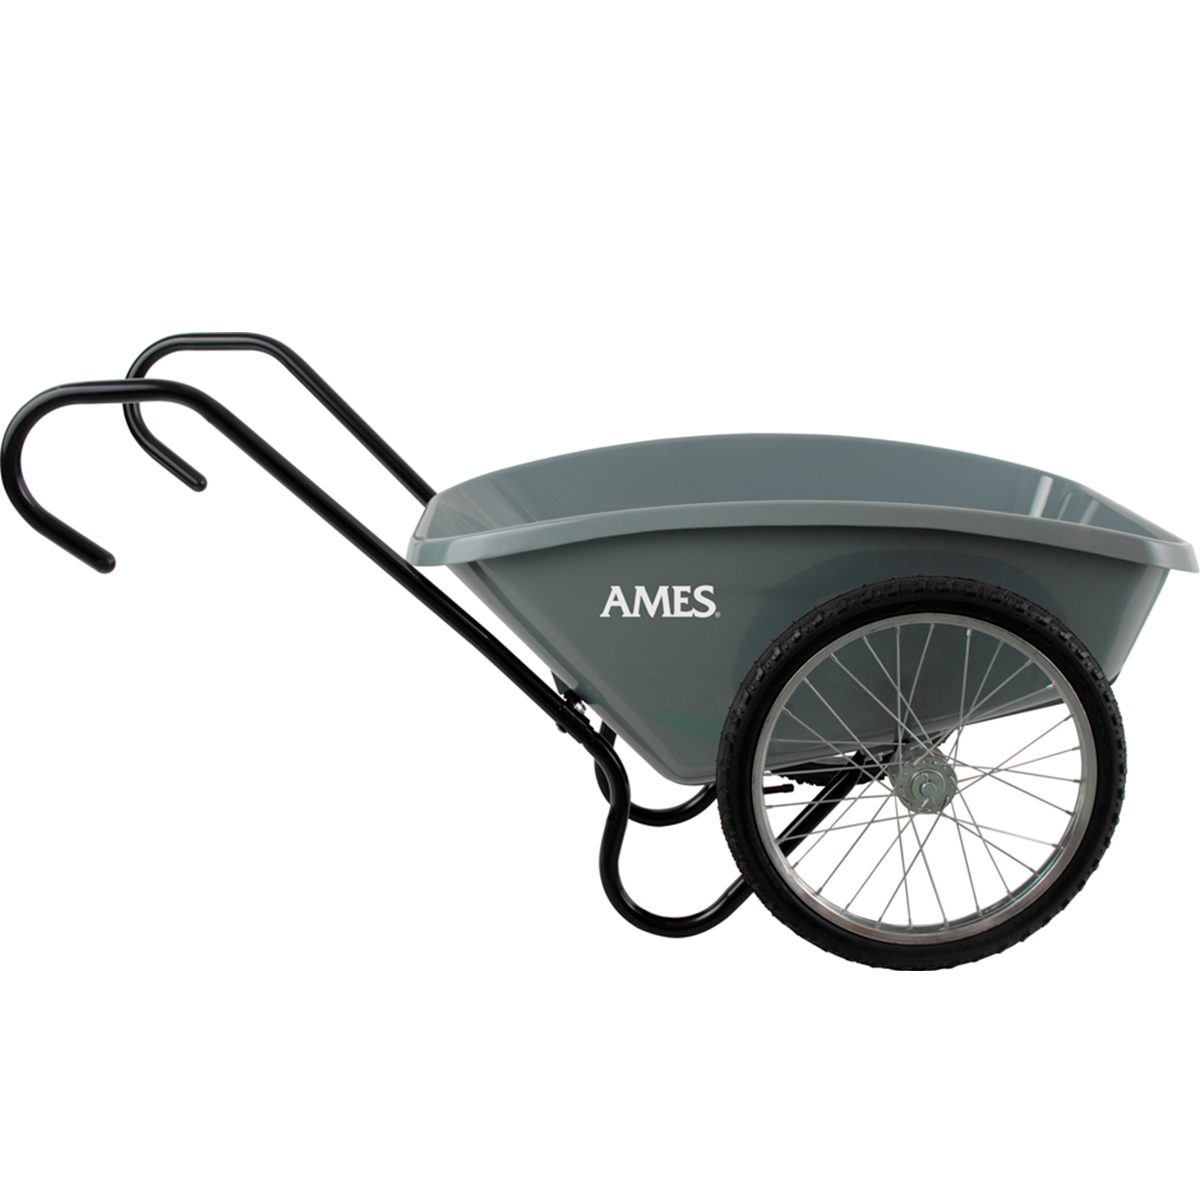 Ames Total Control 5 Cuft Garden Cart wheel barrow